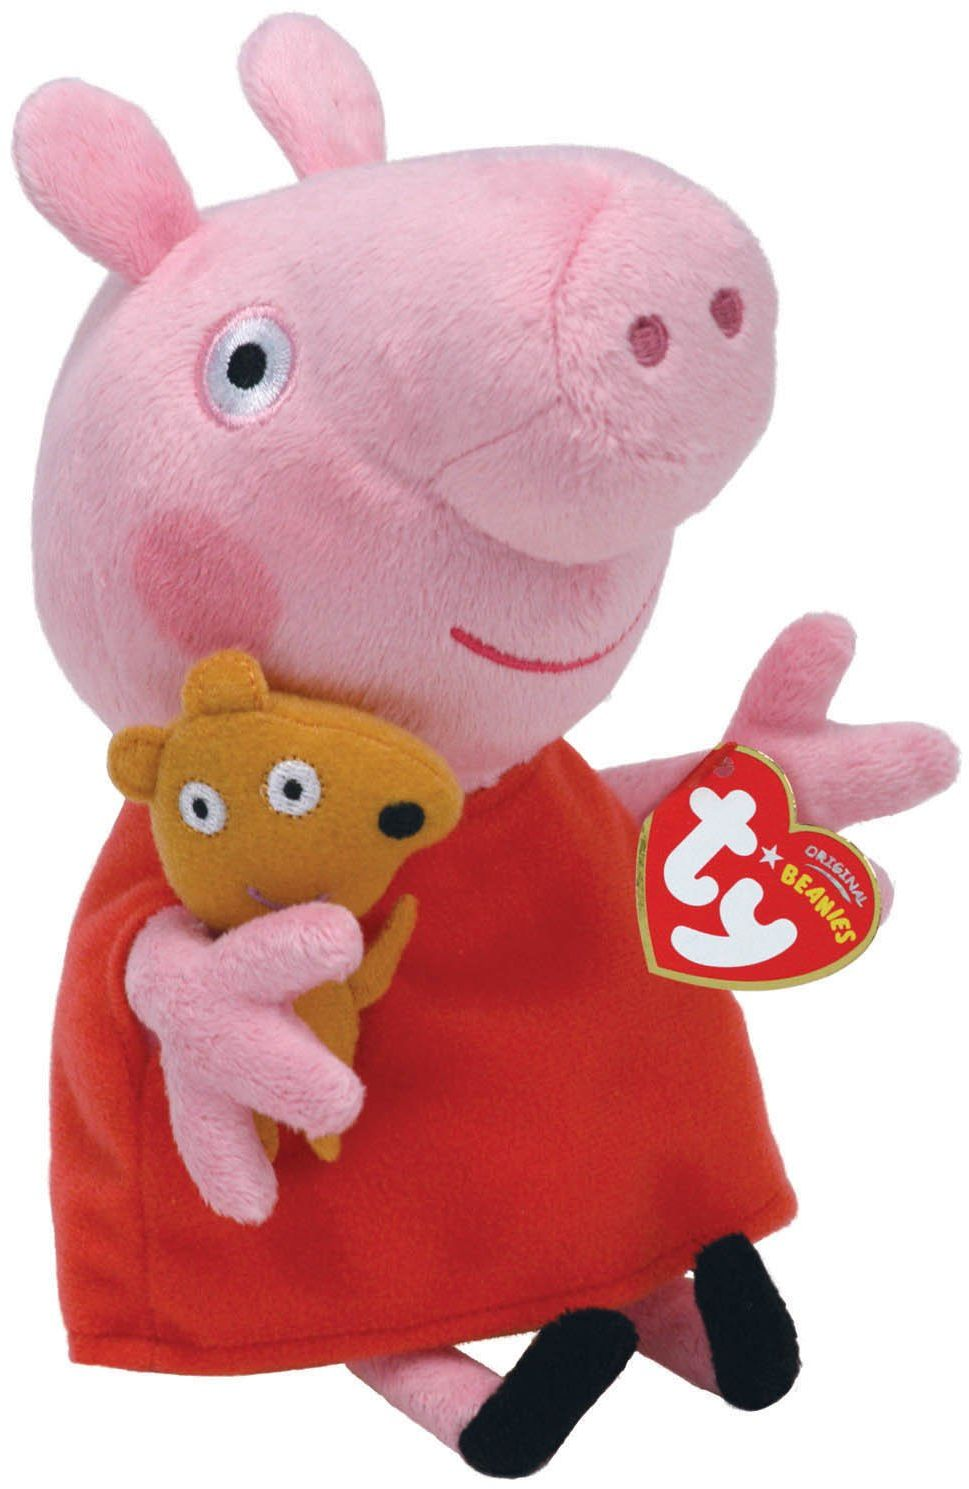 Peppa Pig 7146128 Pluszowa Świnka Peppa, Wielokolorowa